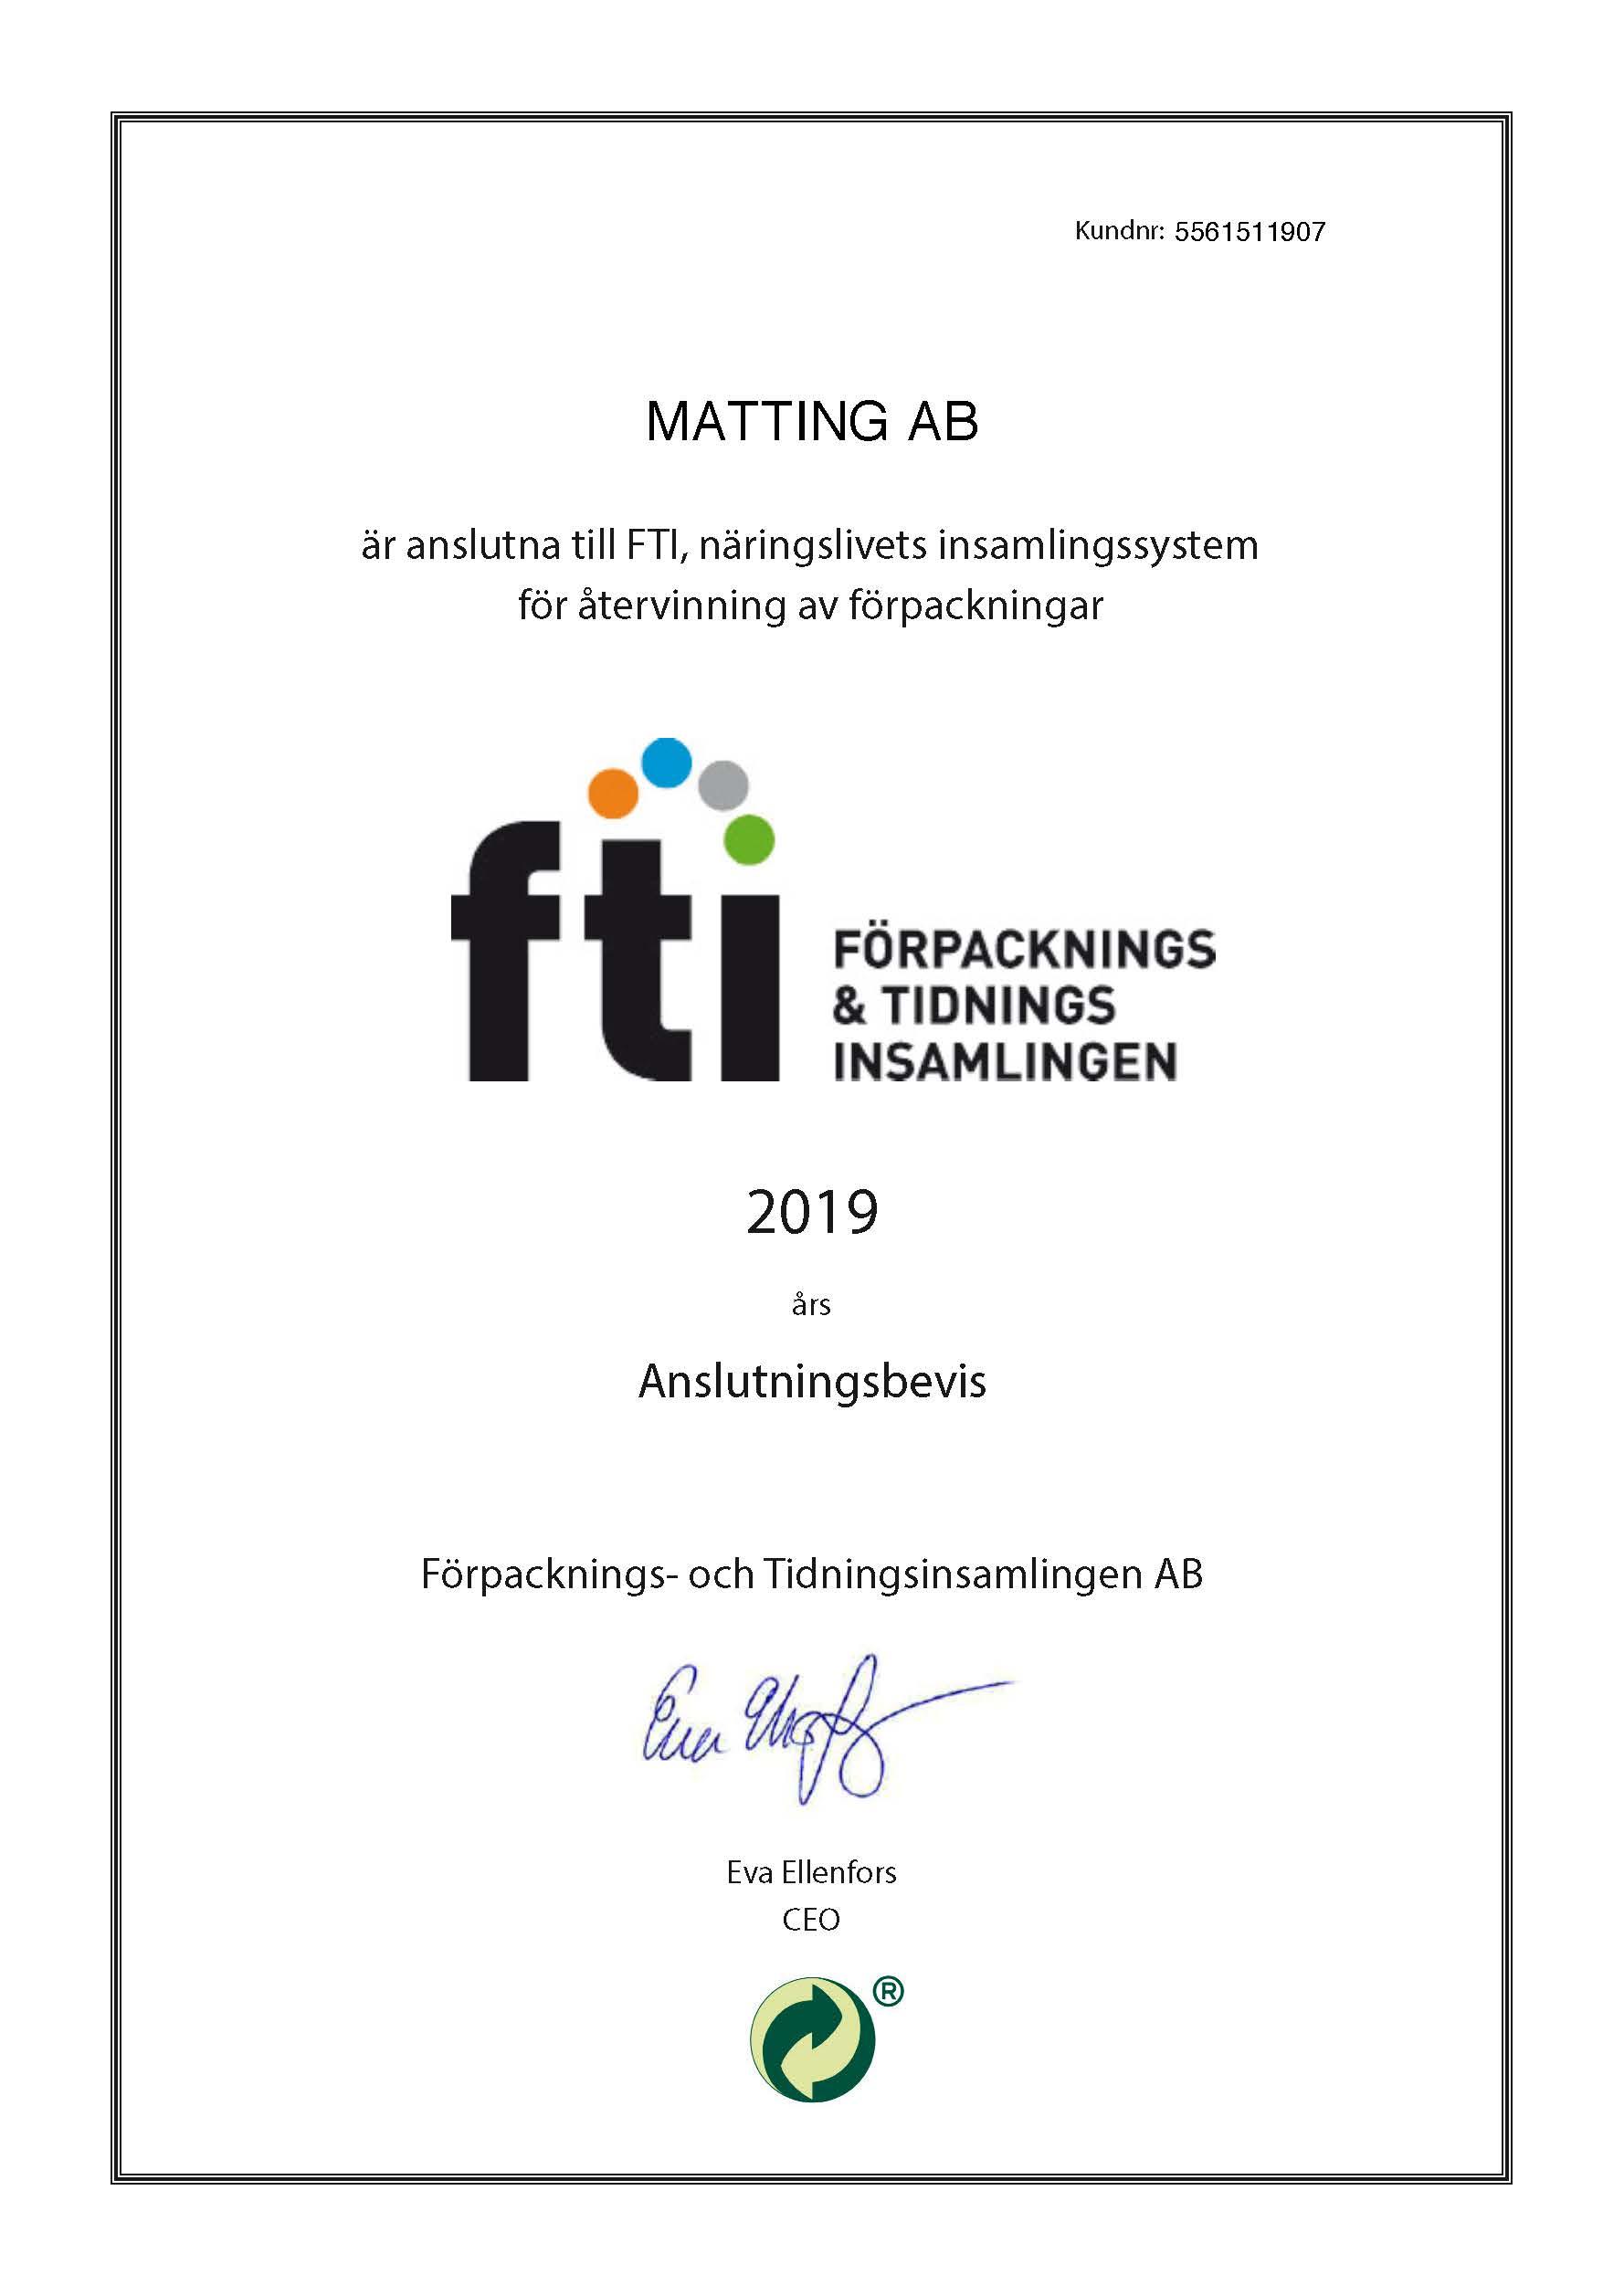 FTI Anslutningsbevis 2019